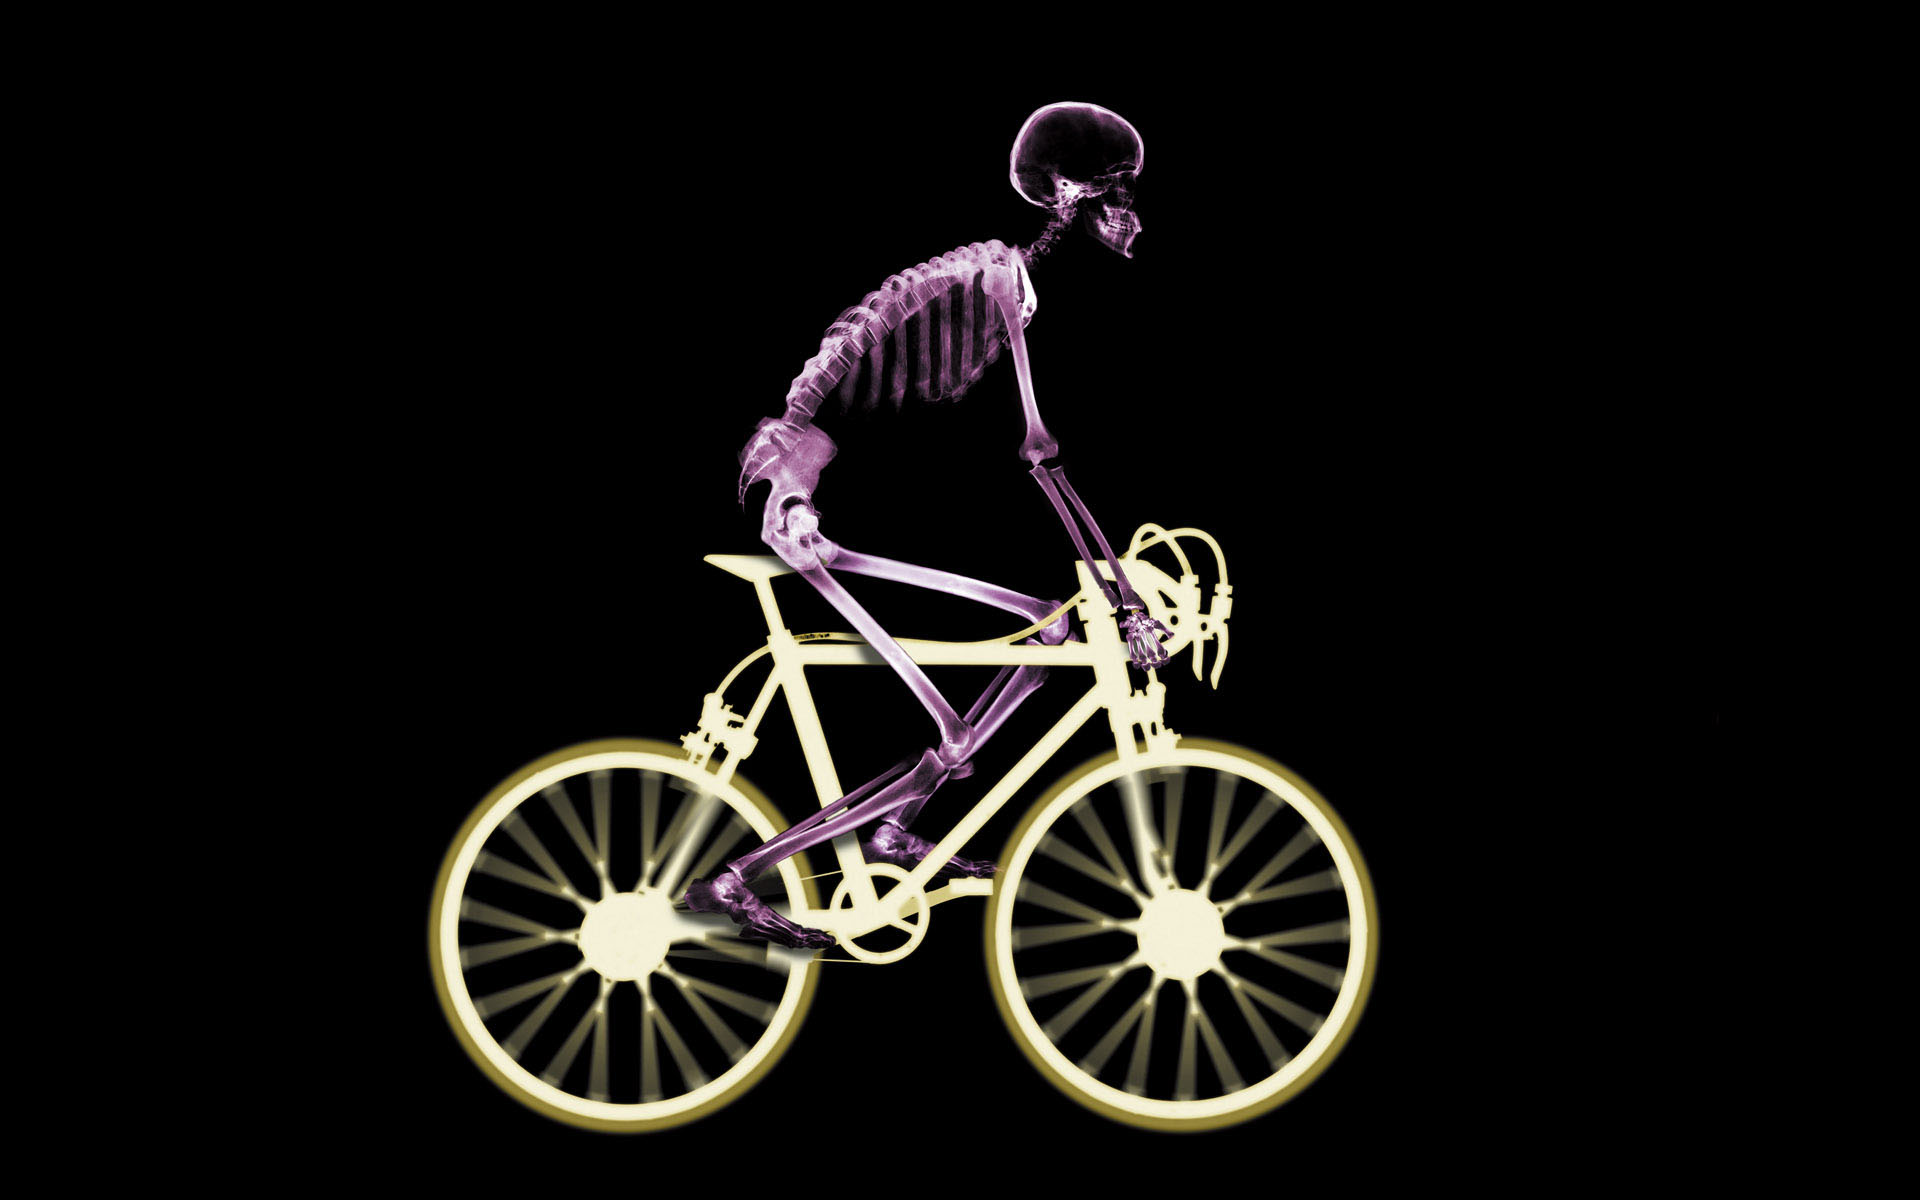 Cycling Wallpaper HD - WallpaperSafari